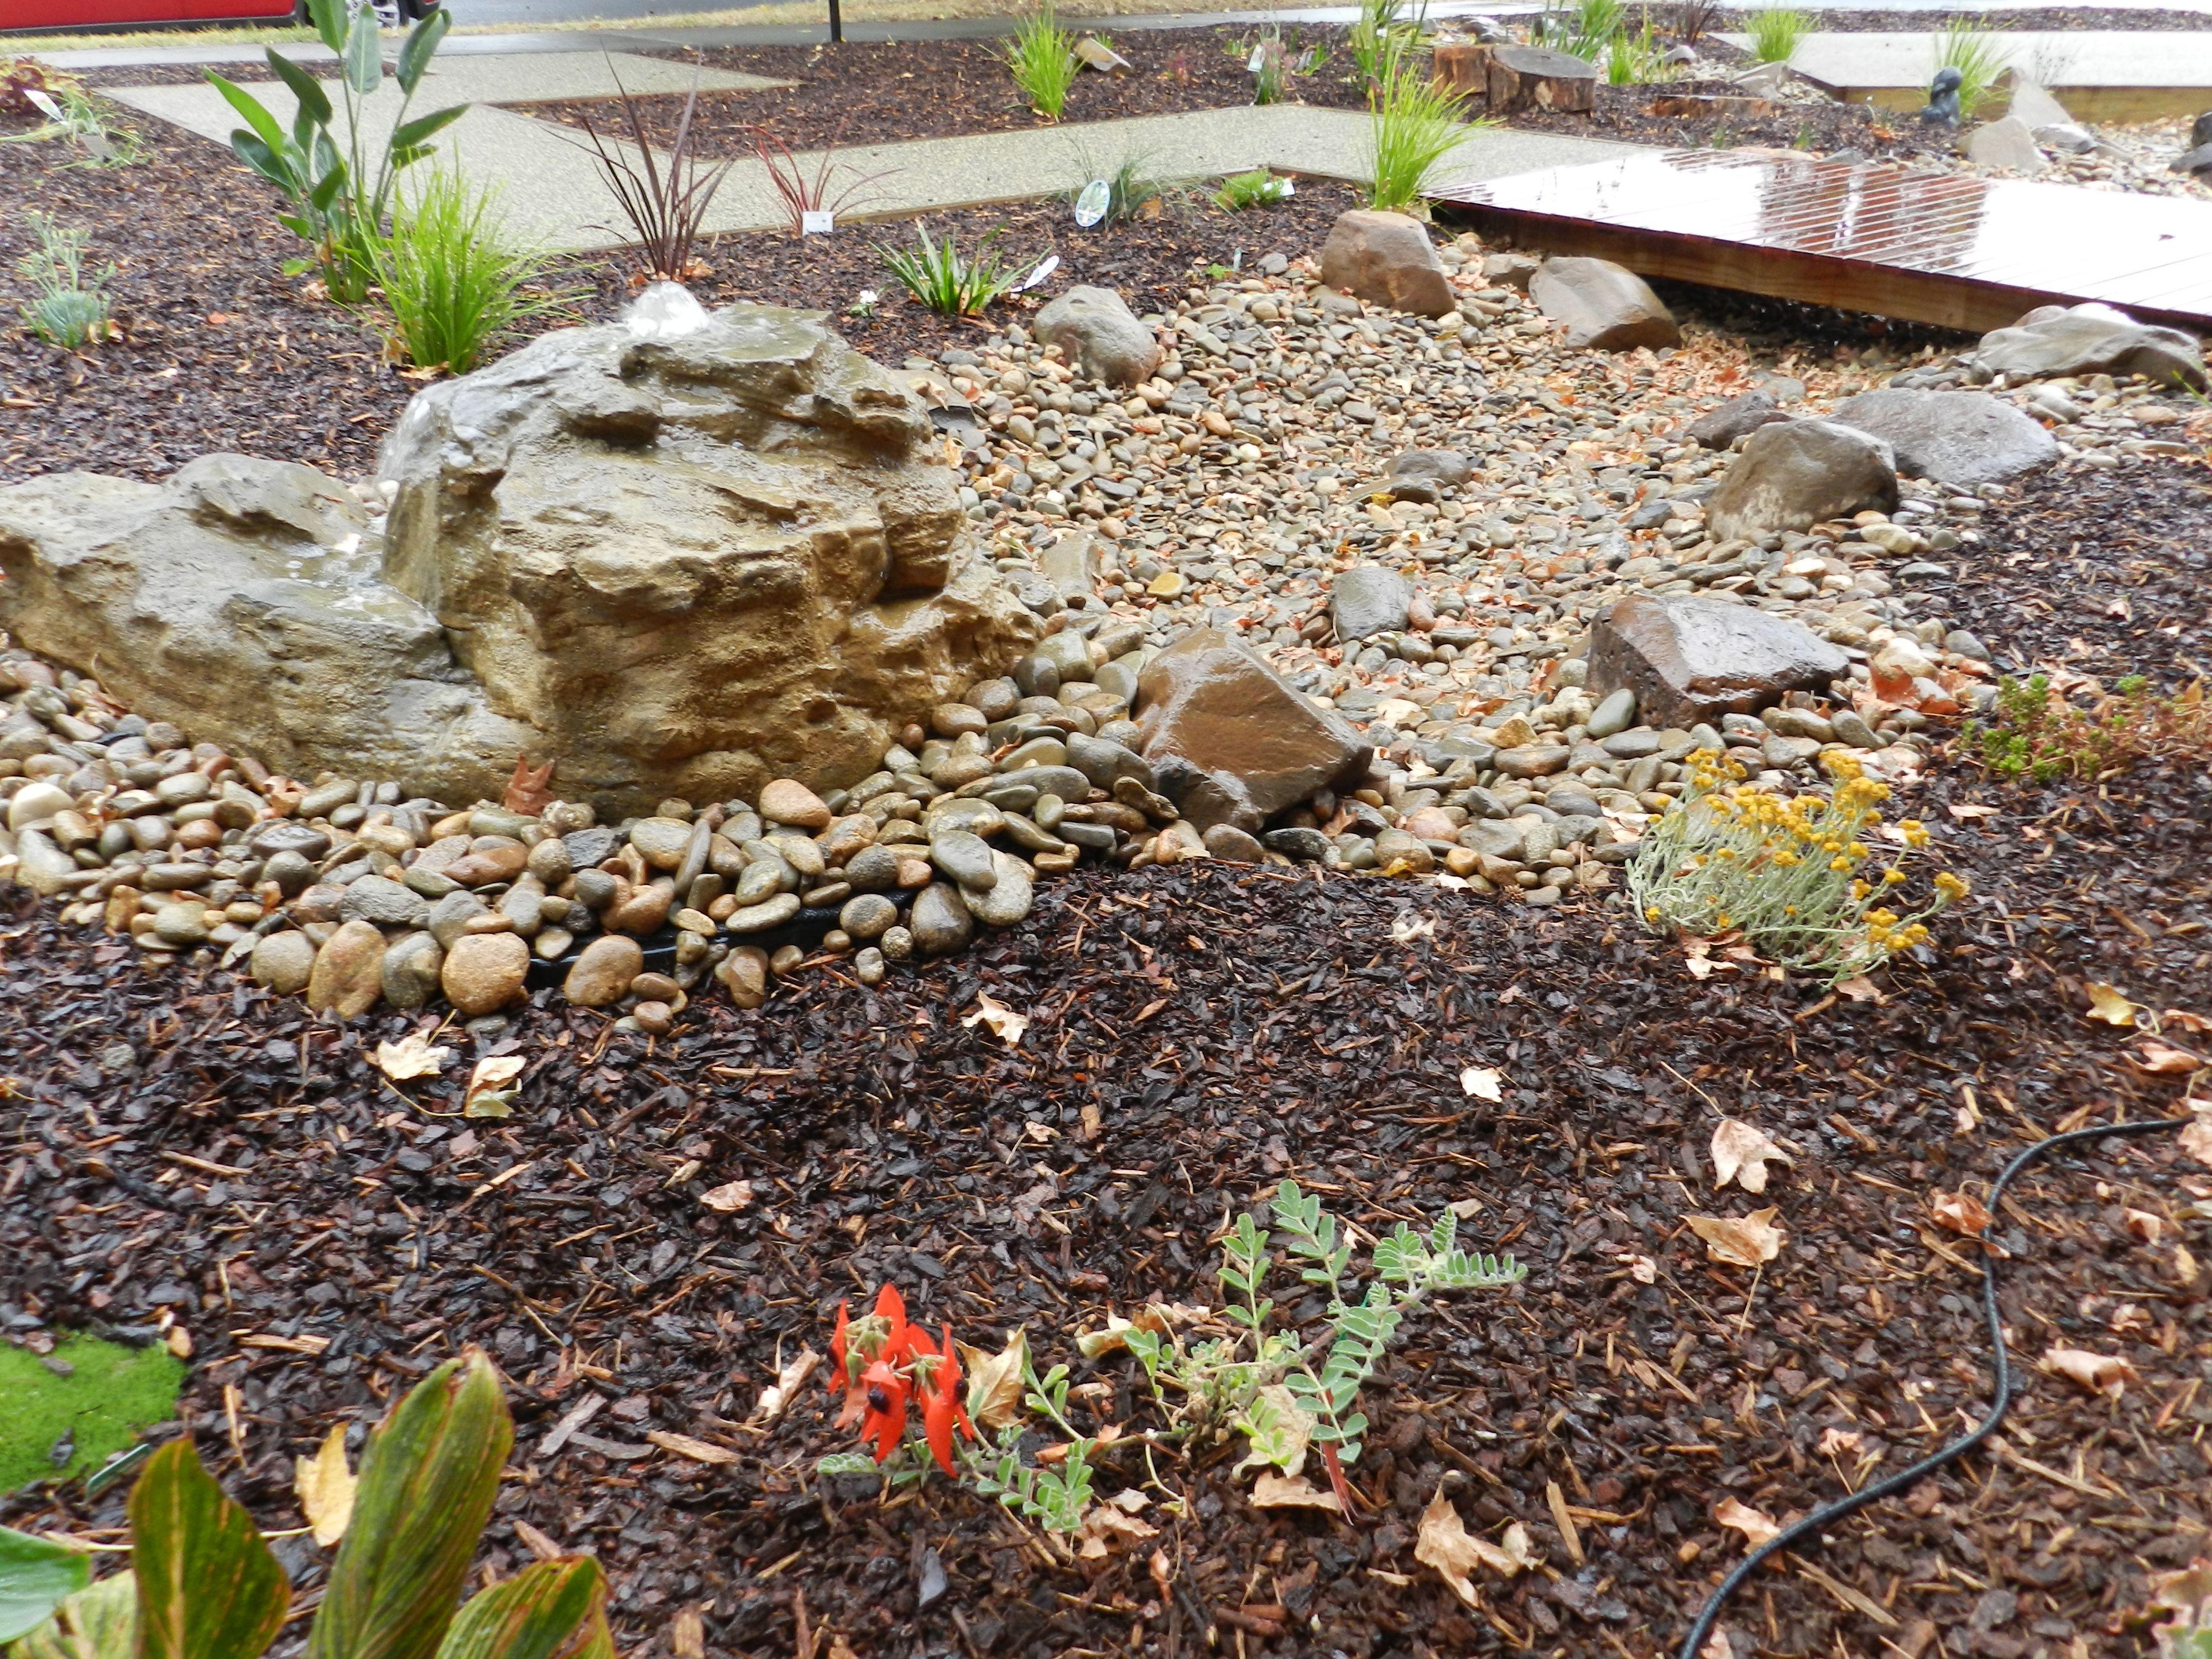 Pin By Alita Marchand On Garden Beautiful Gardens Outdoor Gardens Water Features